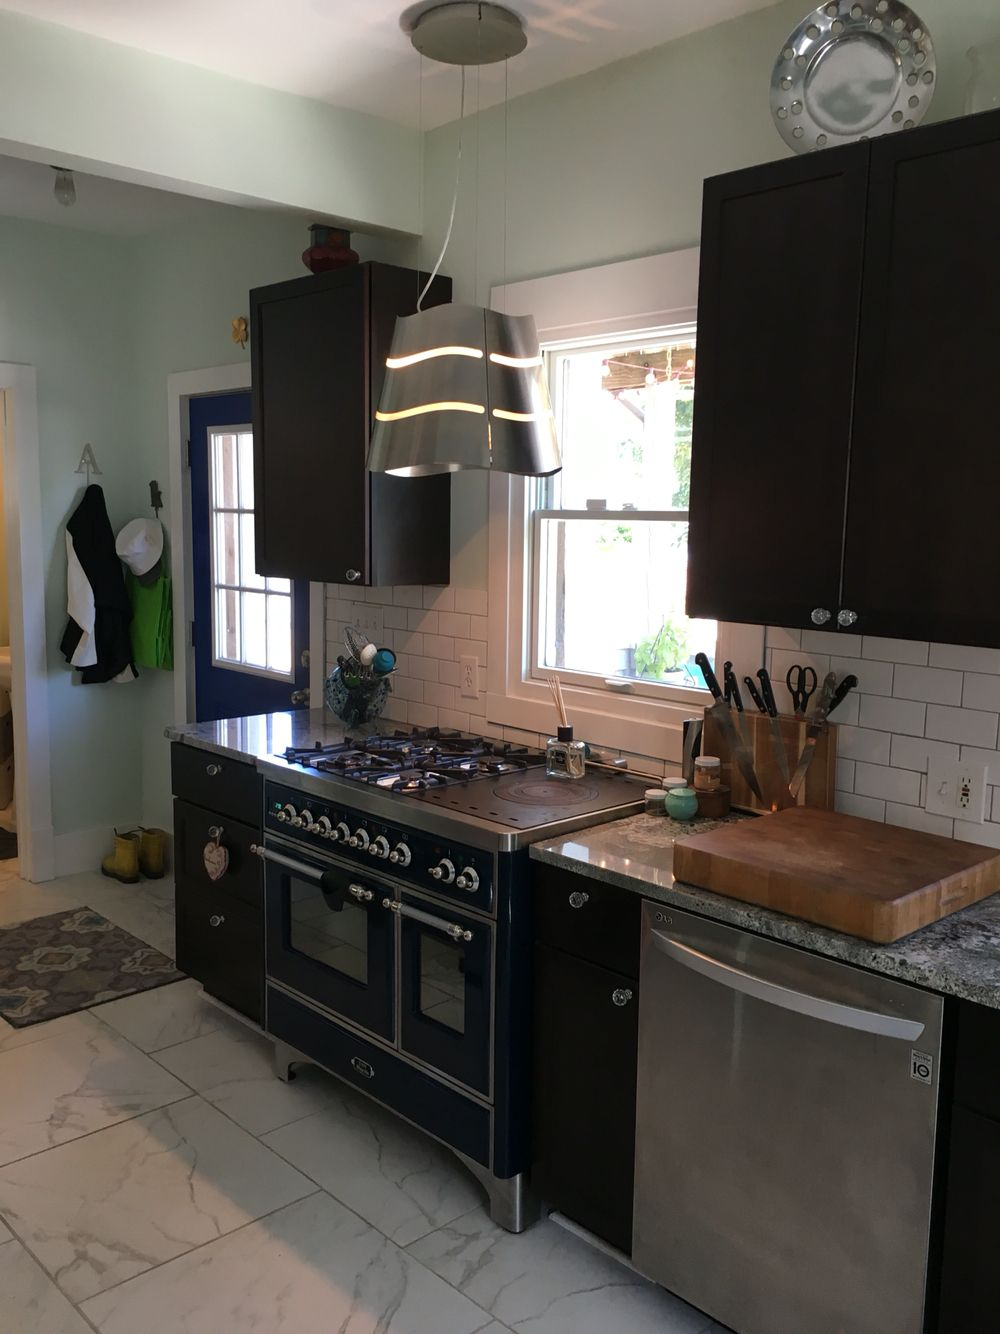 Ilve Stove Elica Hood Vent And A Coordinating Blue Door Home Decor Blue Door Ilve